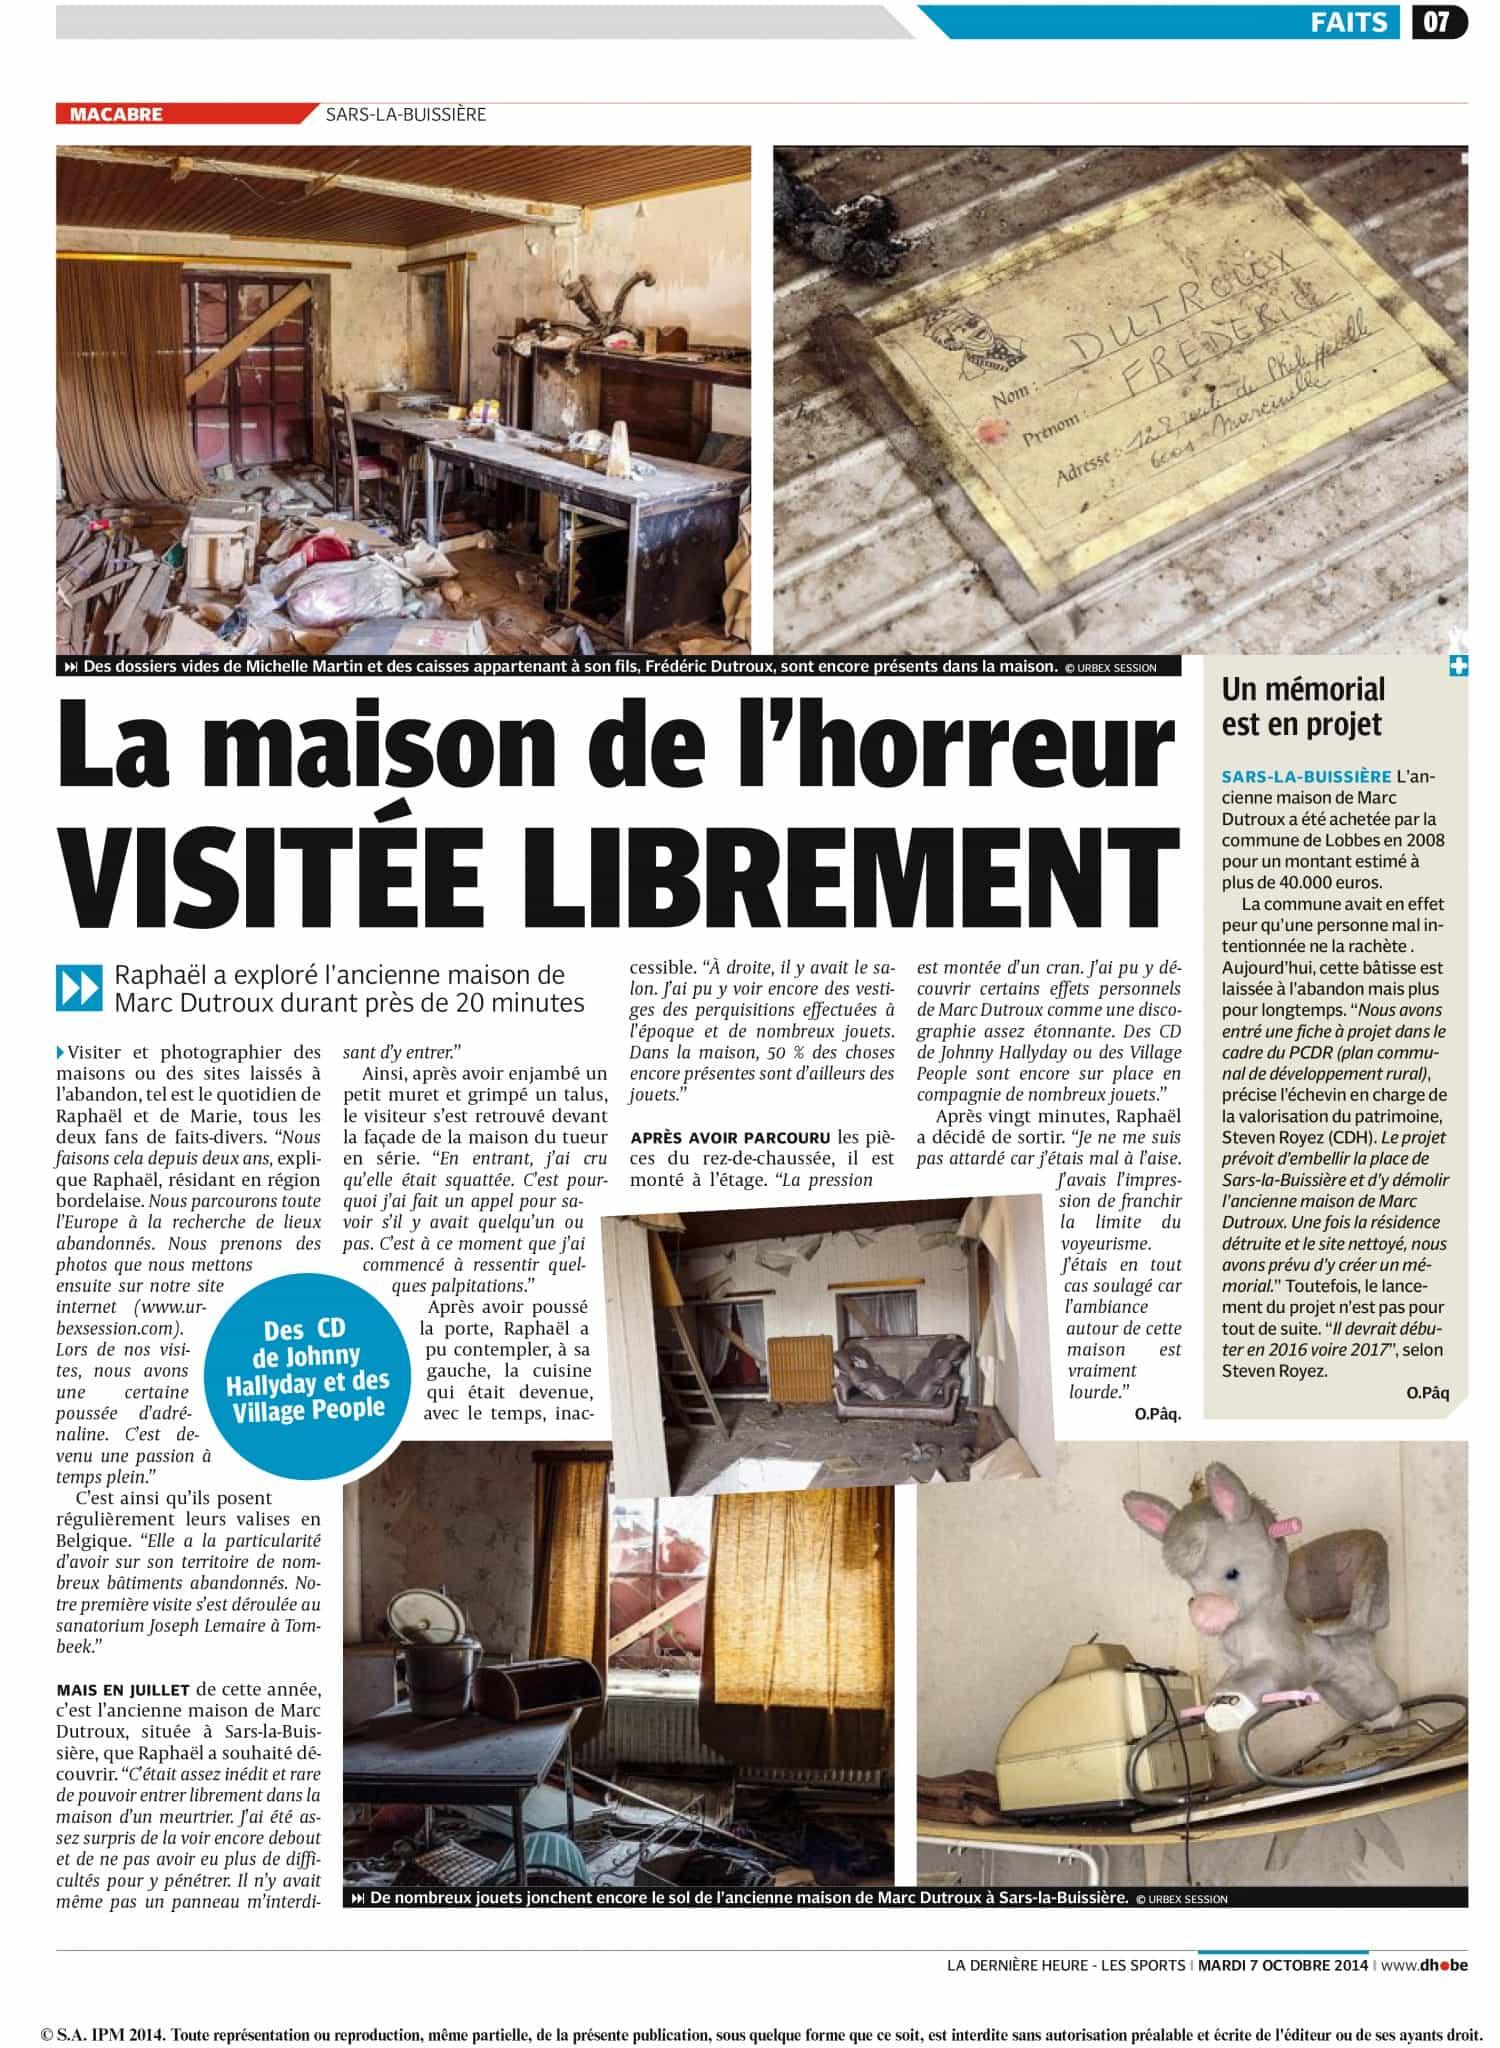 derniere-heure-07-10-2014-marc-dutroux-7